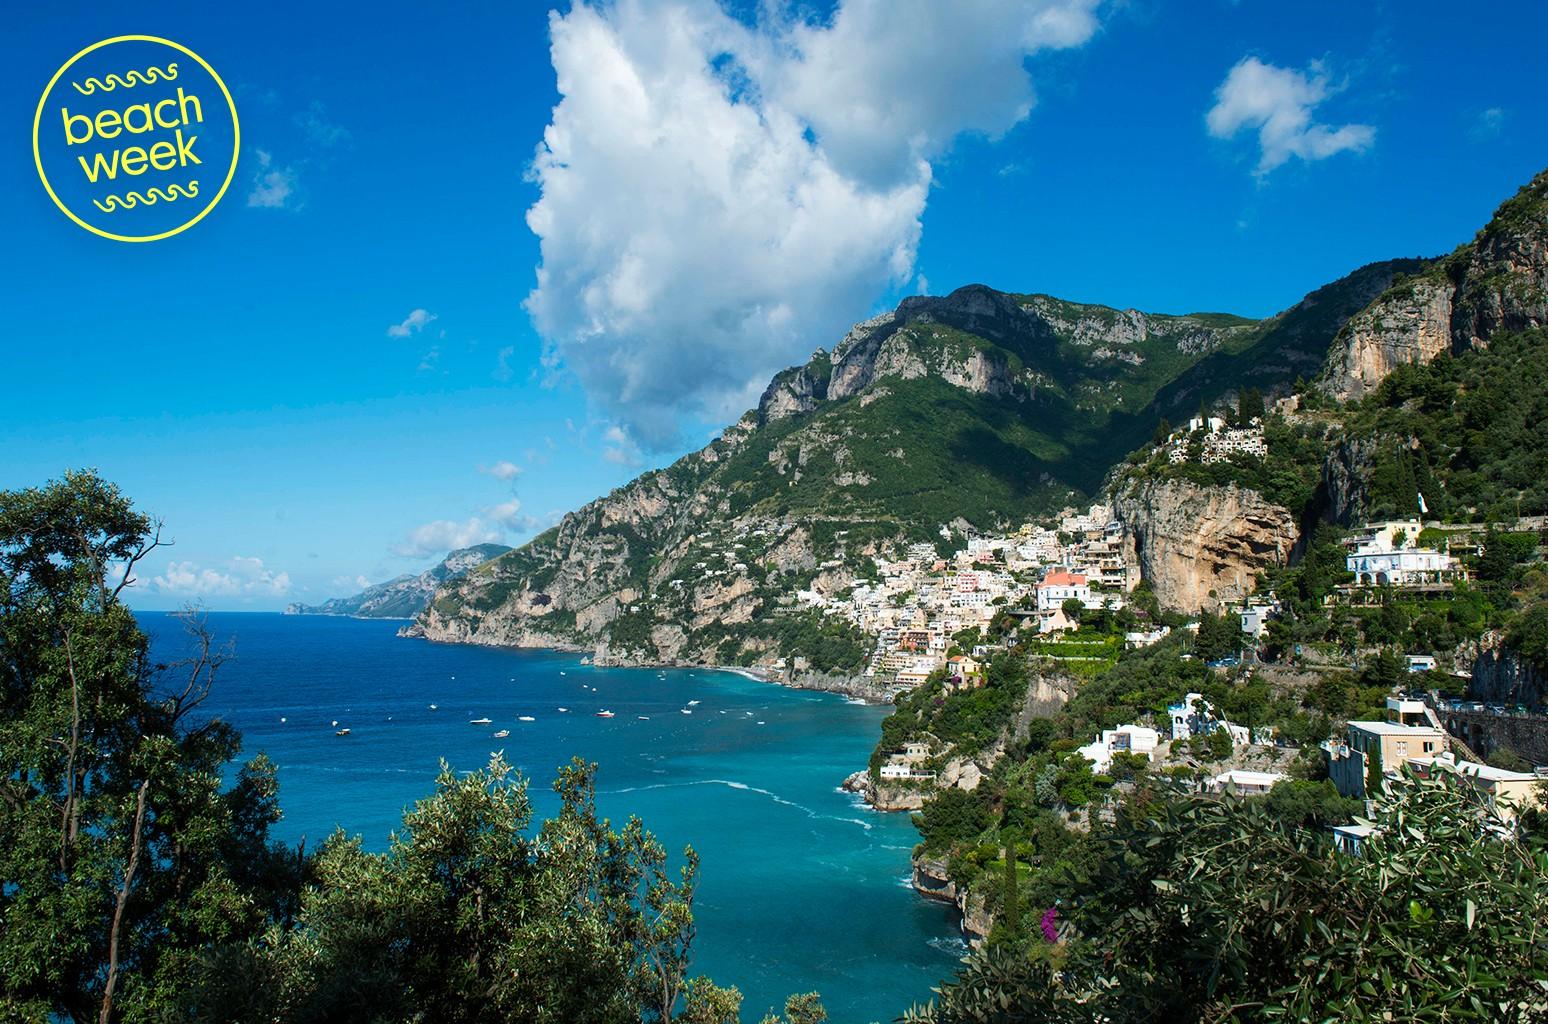 Positano, a town on the Amalfi Coast, Italy.